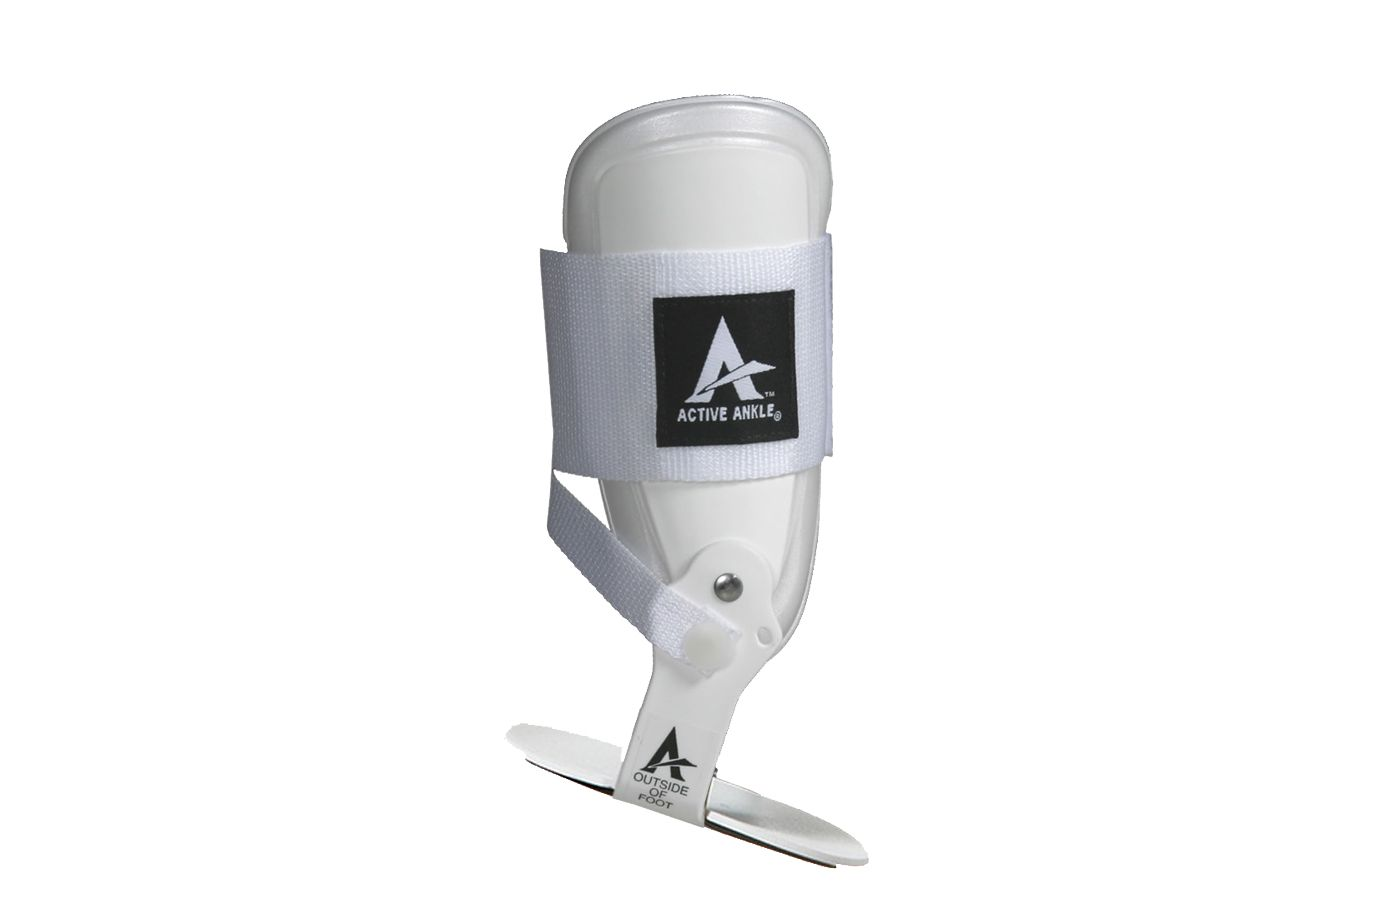 Active Ankle T2 Rigid Multi-Sport Ankle Brace